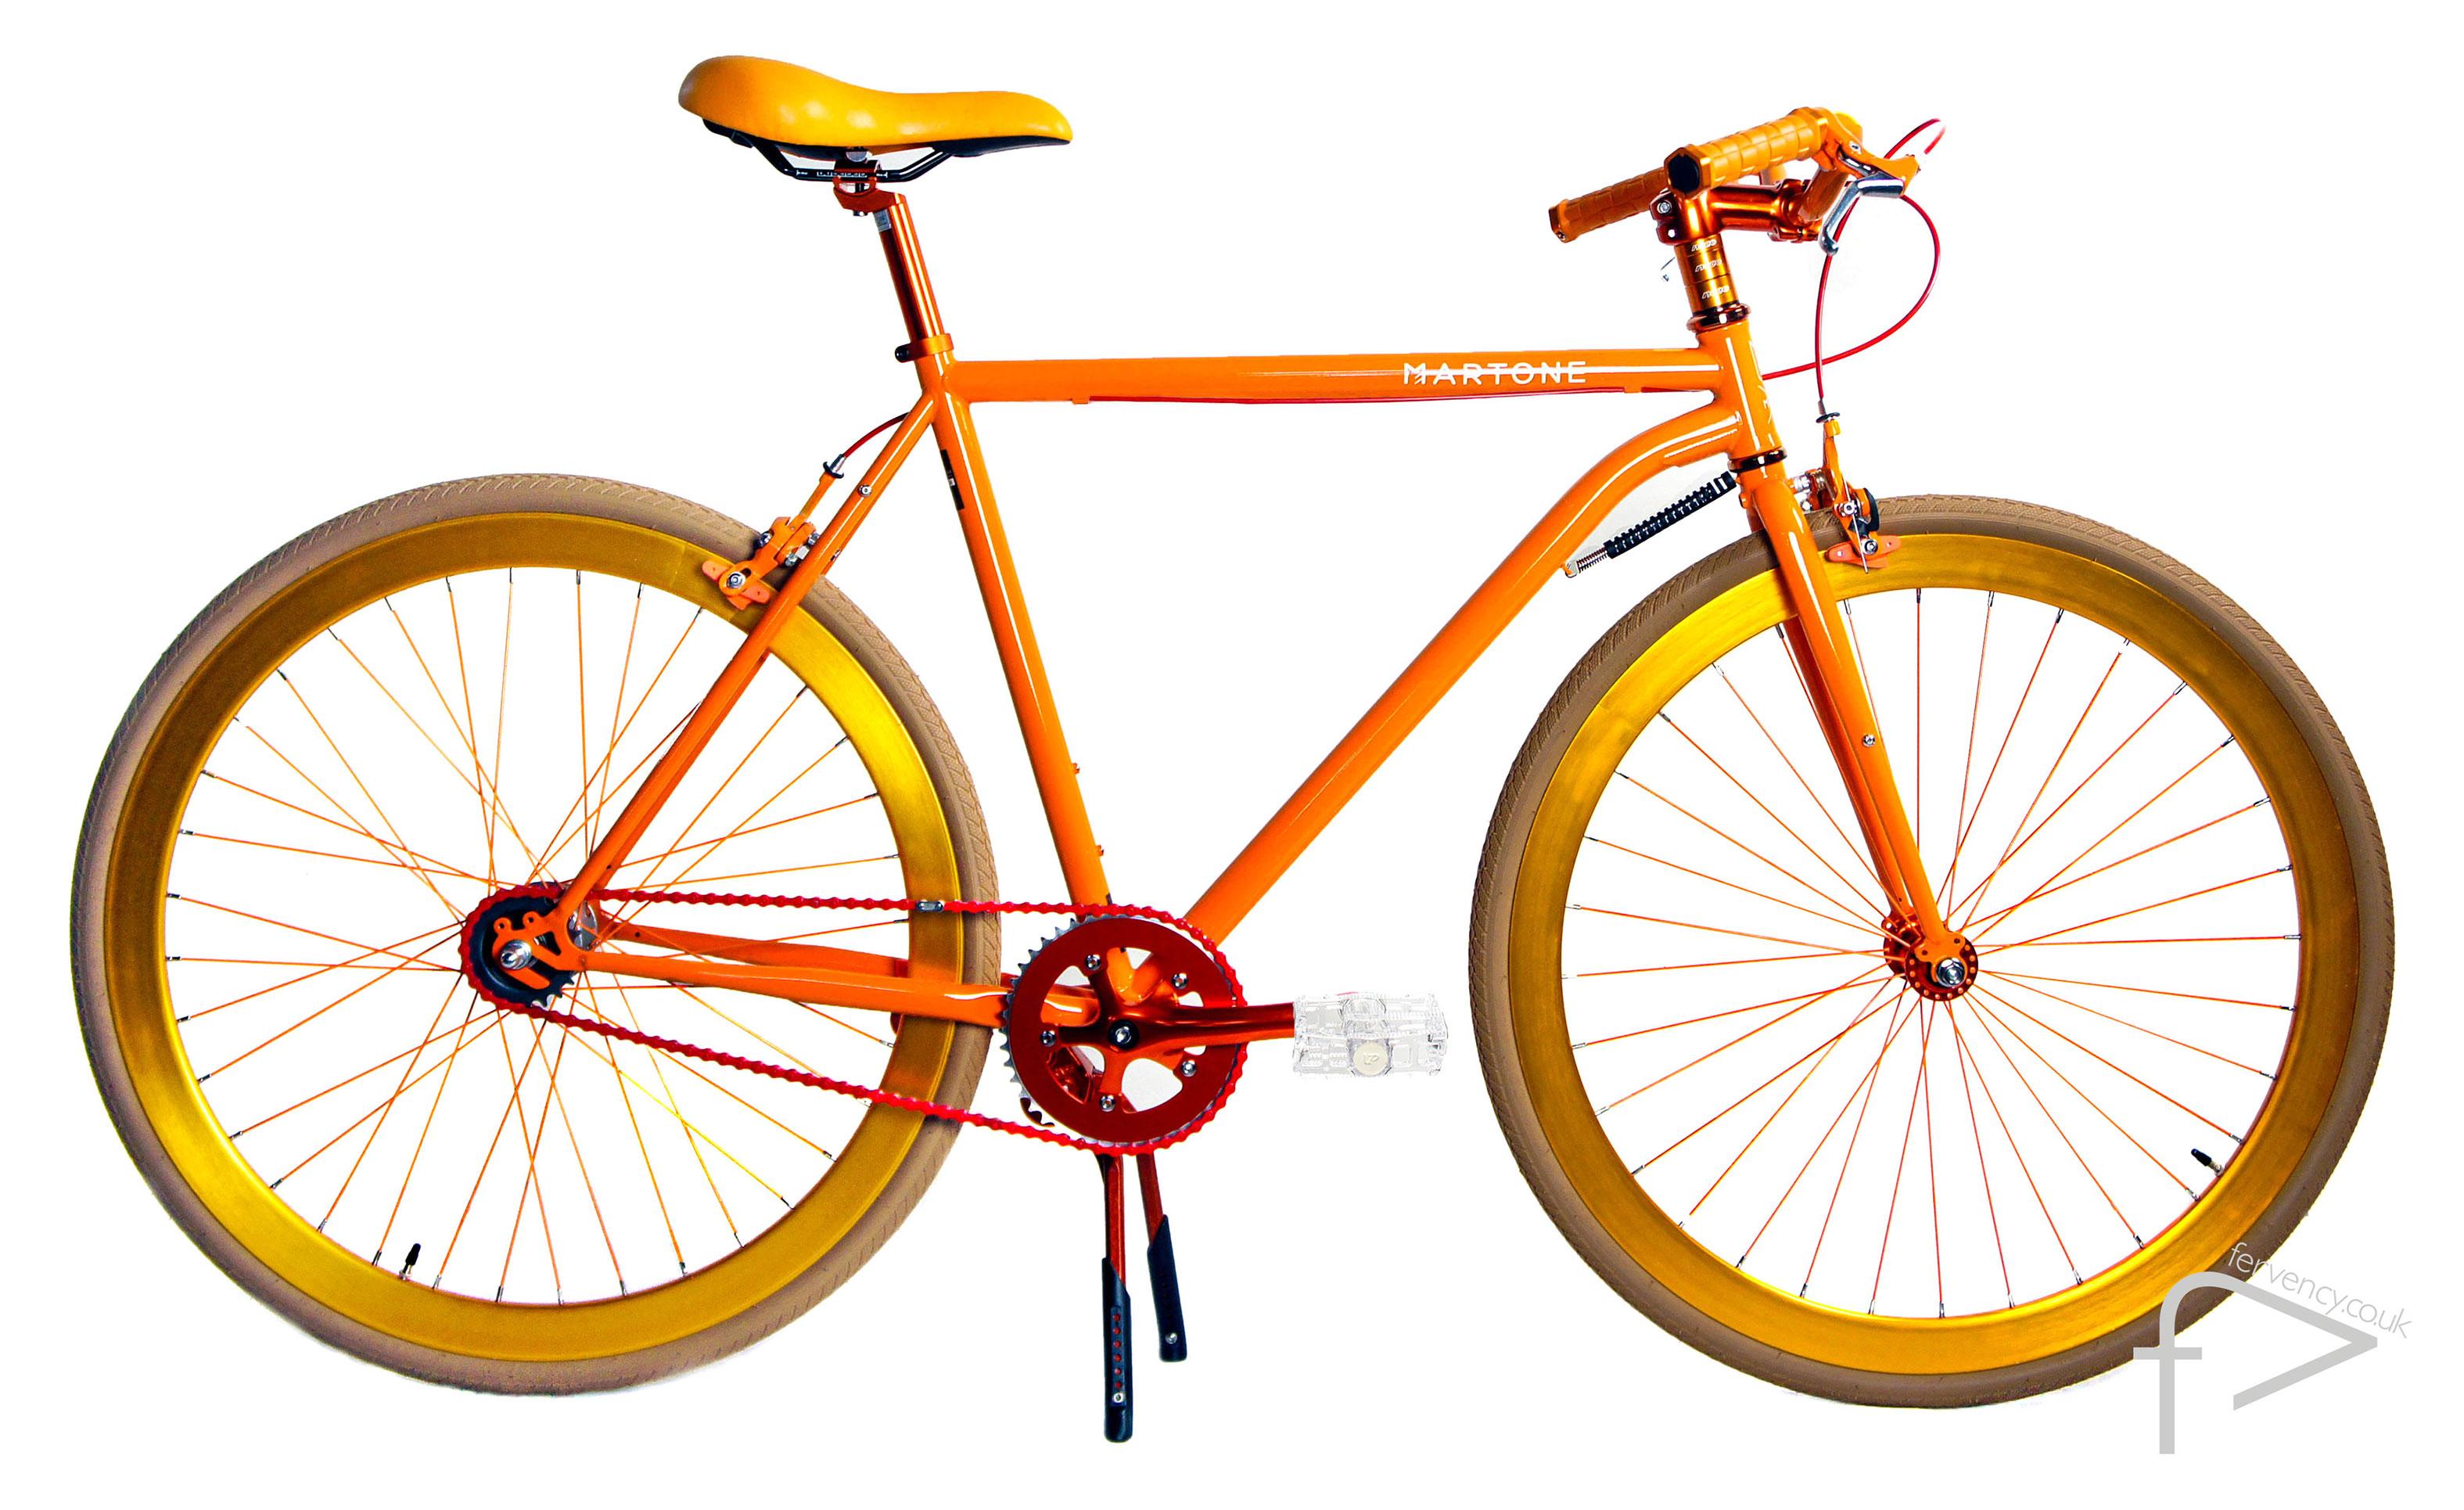 Saint Germain Orange Bike UK